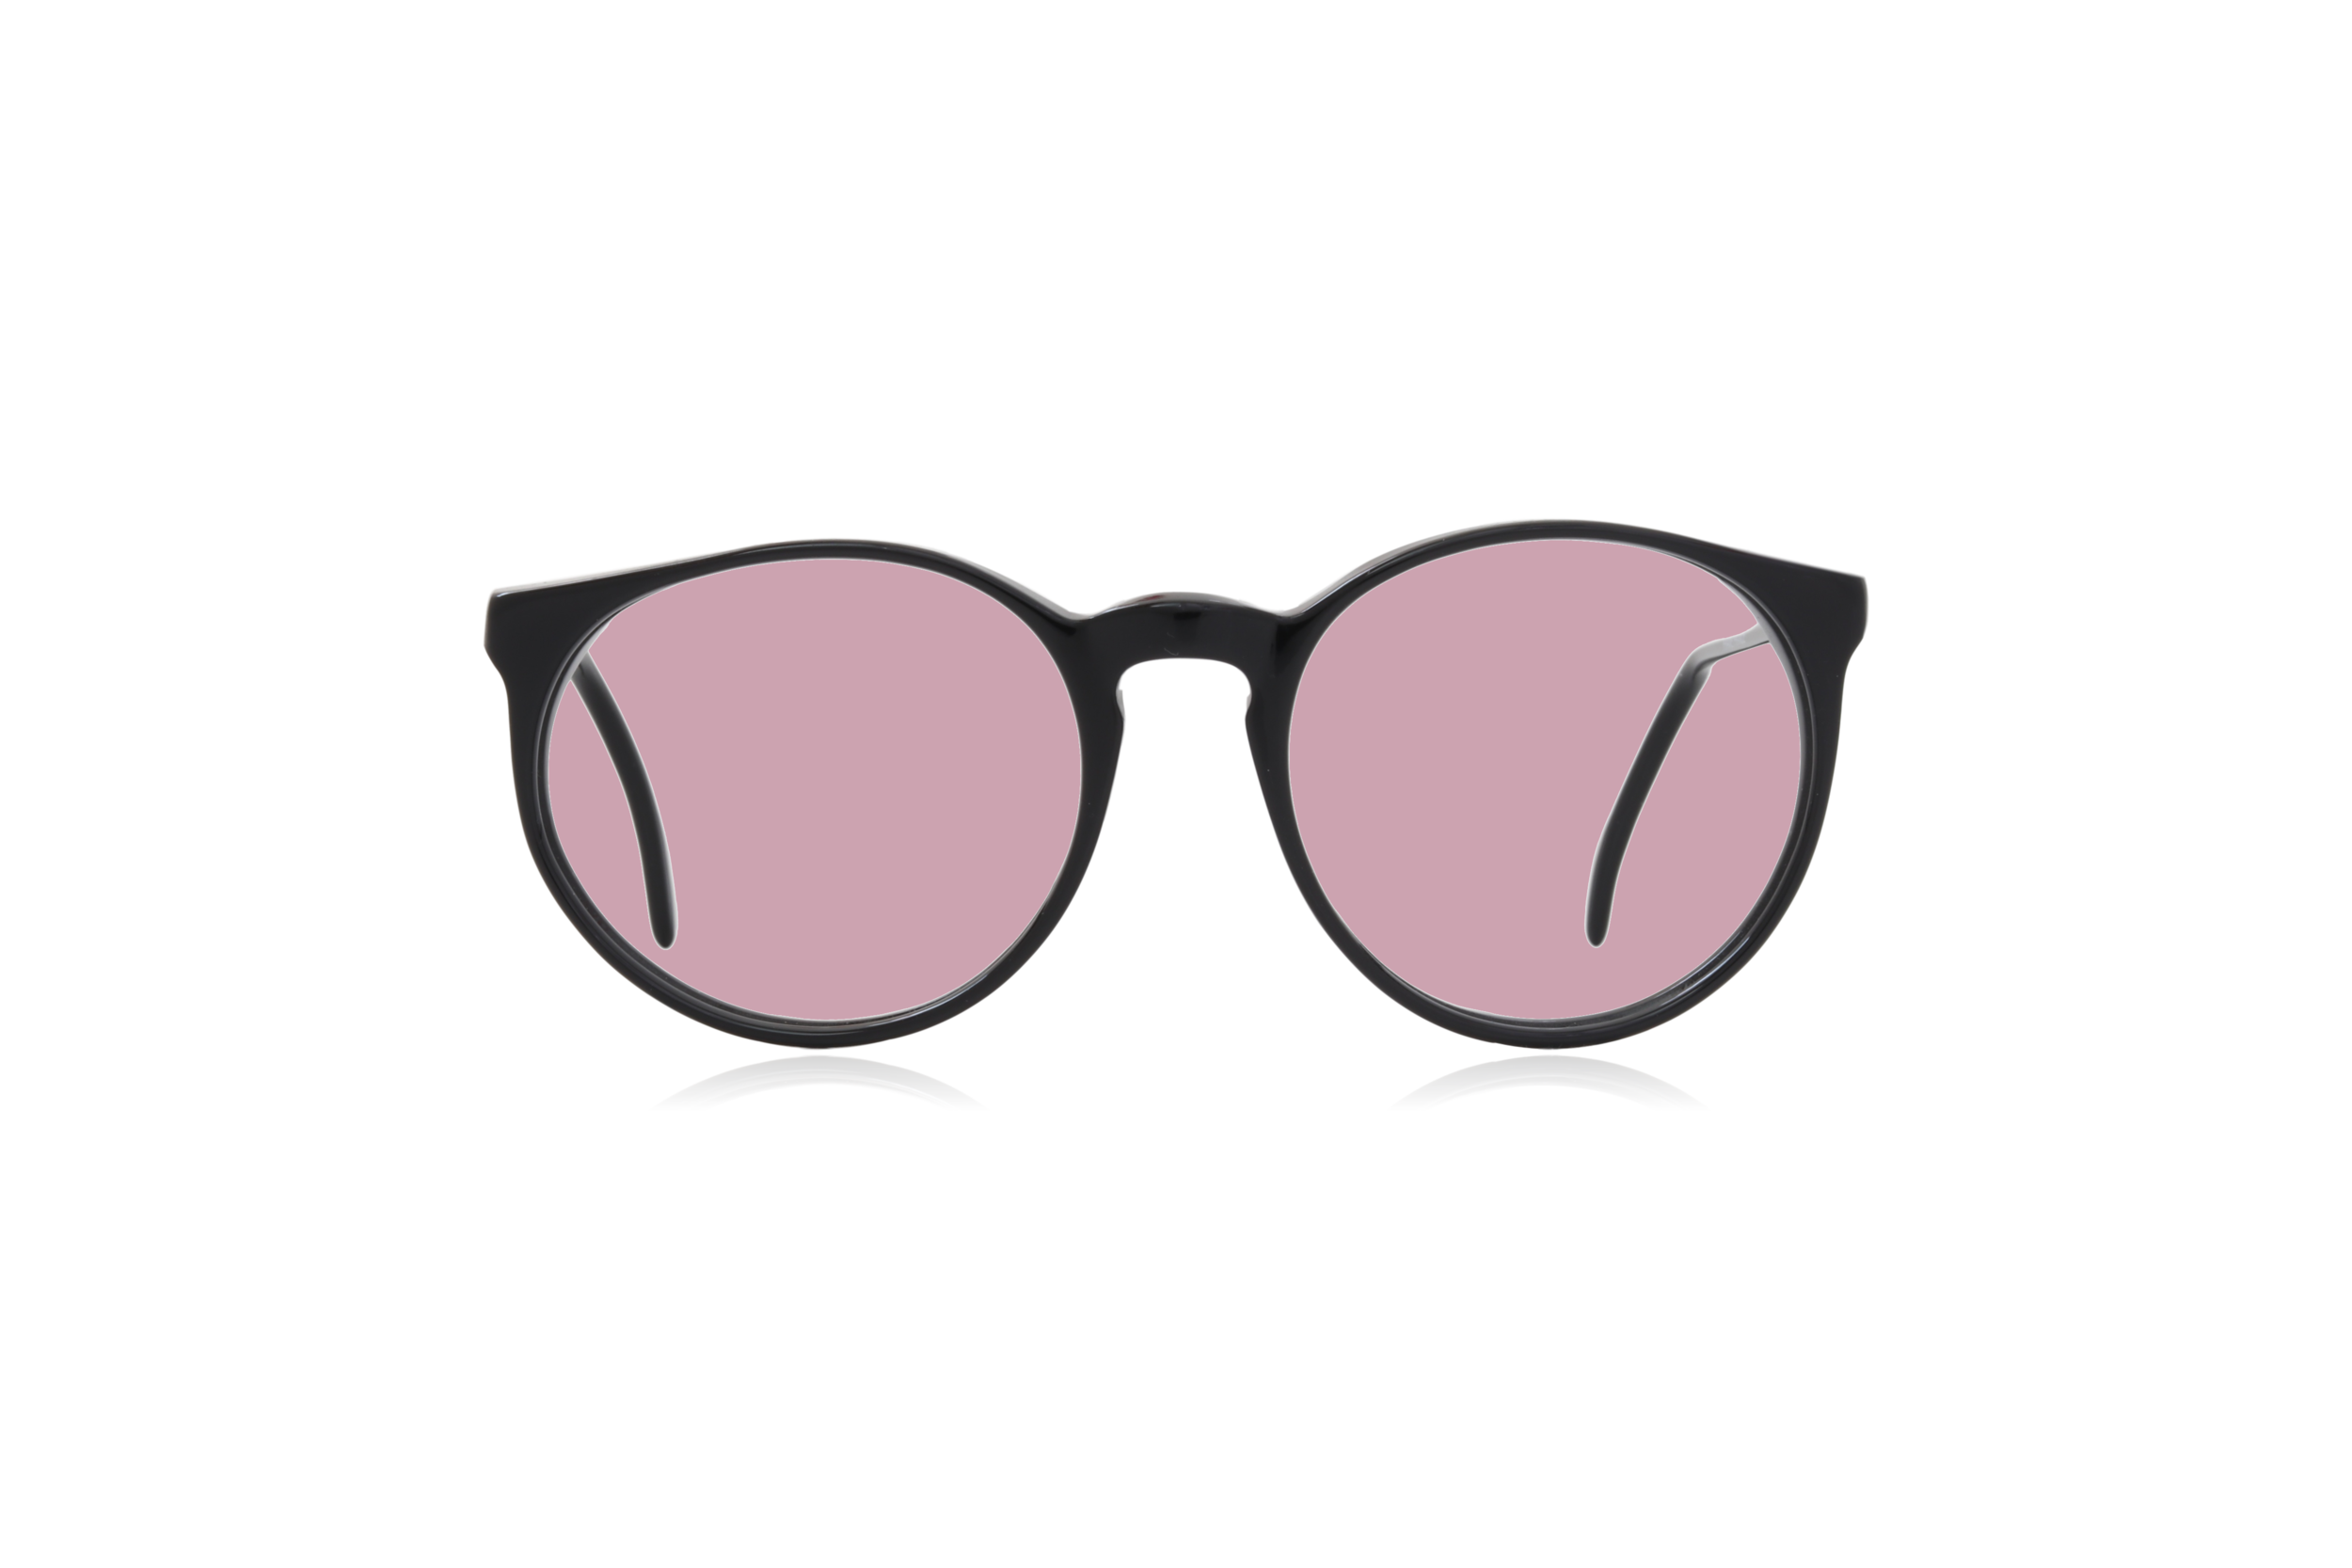 Peep Eyewear, Vintage Glasses, 1980s, Morel 2730, 1980s, Pink Lenses.png